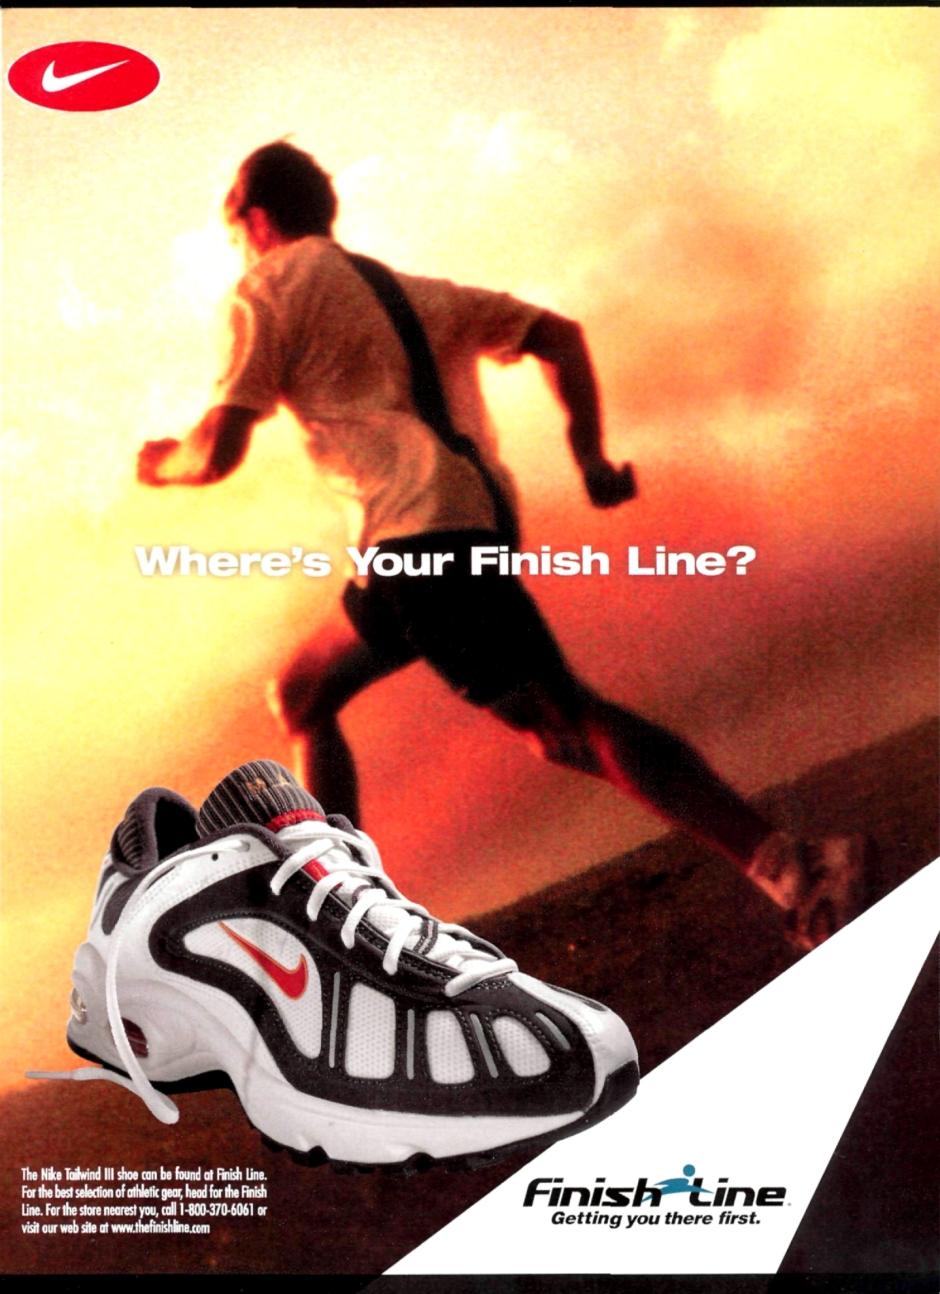 nike tailwind iii ad finish line 1998.jpg